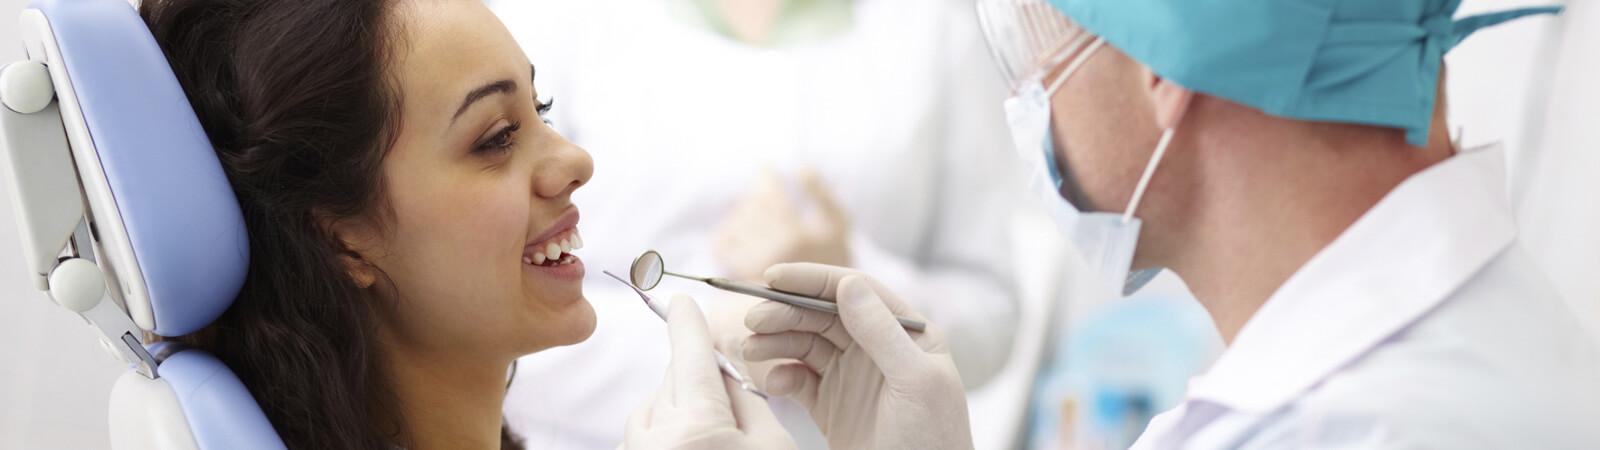 Meet the Doctor - Vivid Dental, Houston TX